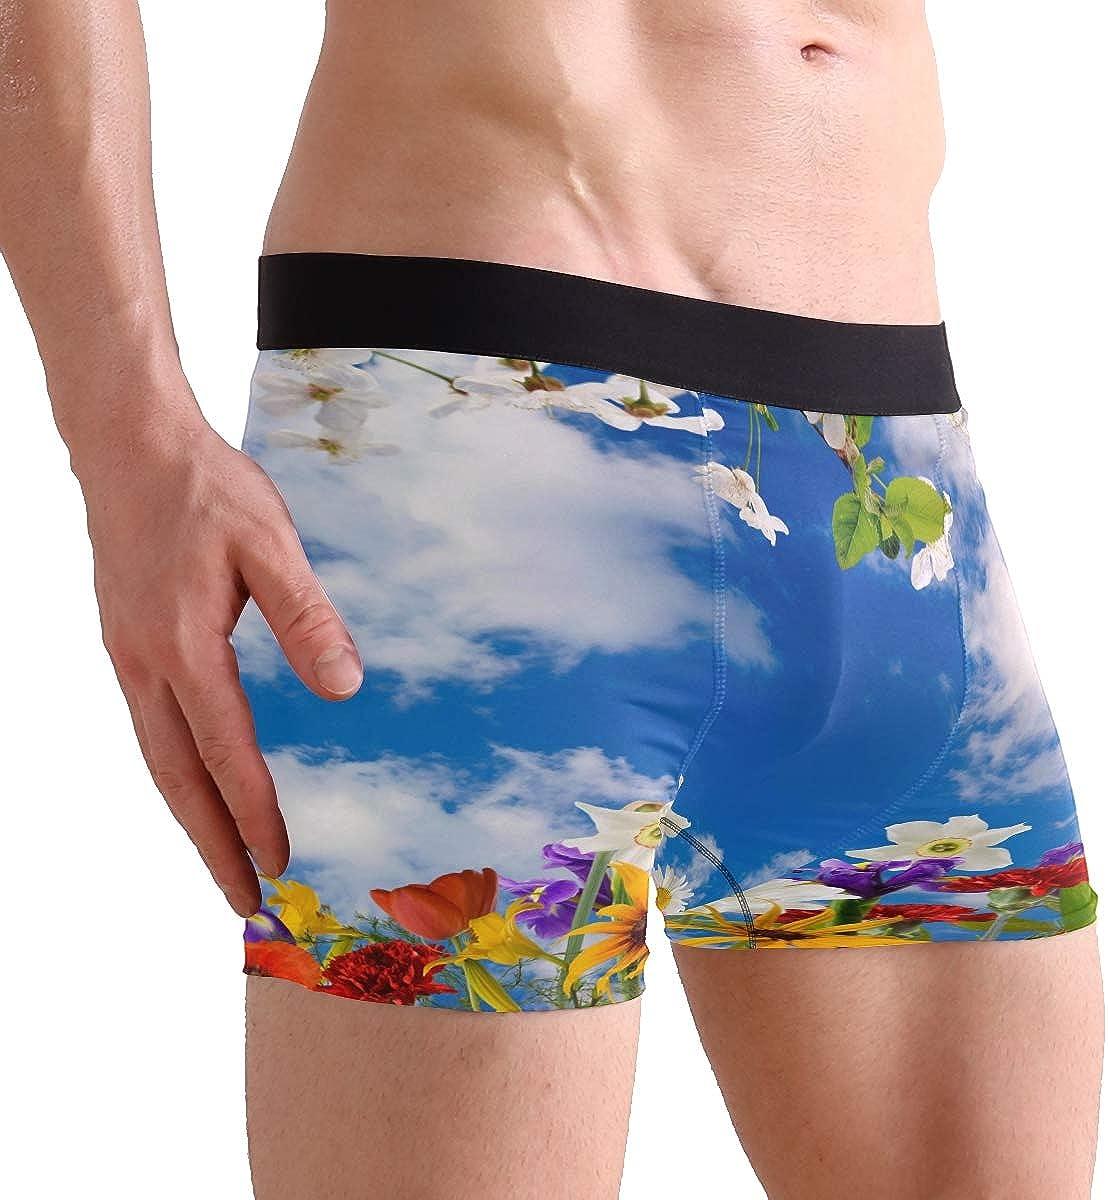 Love Heart Floral Flower Short Underwear Soft Stretch Underpants for Men Boys S-XL BETTKEN Mens Boxer Briefs